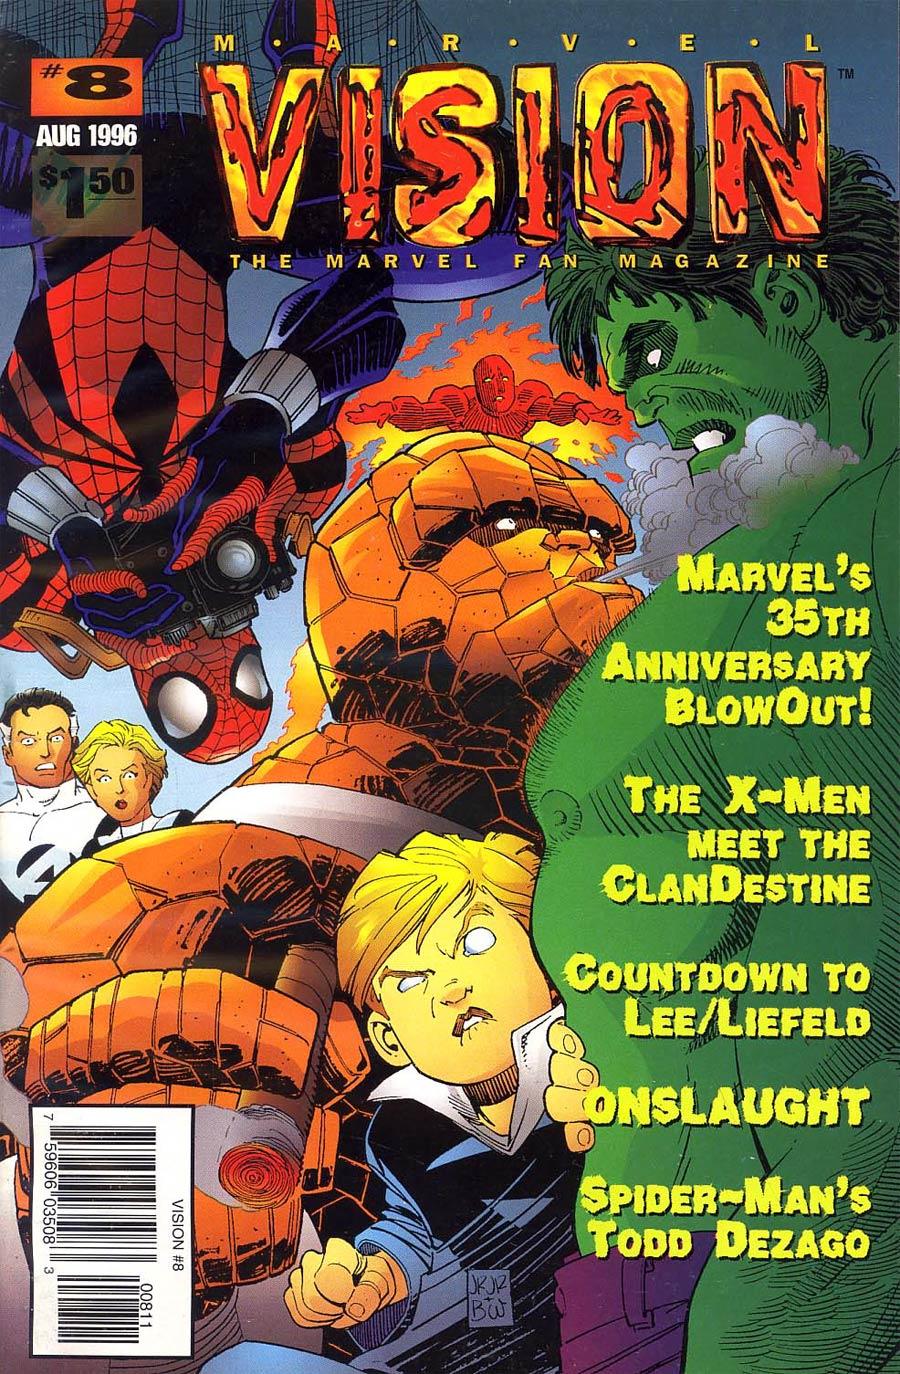 Marvel Vision #8